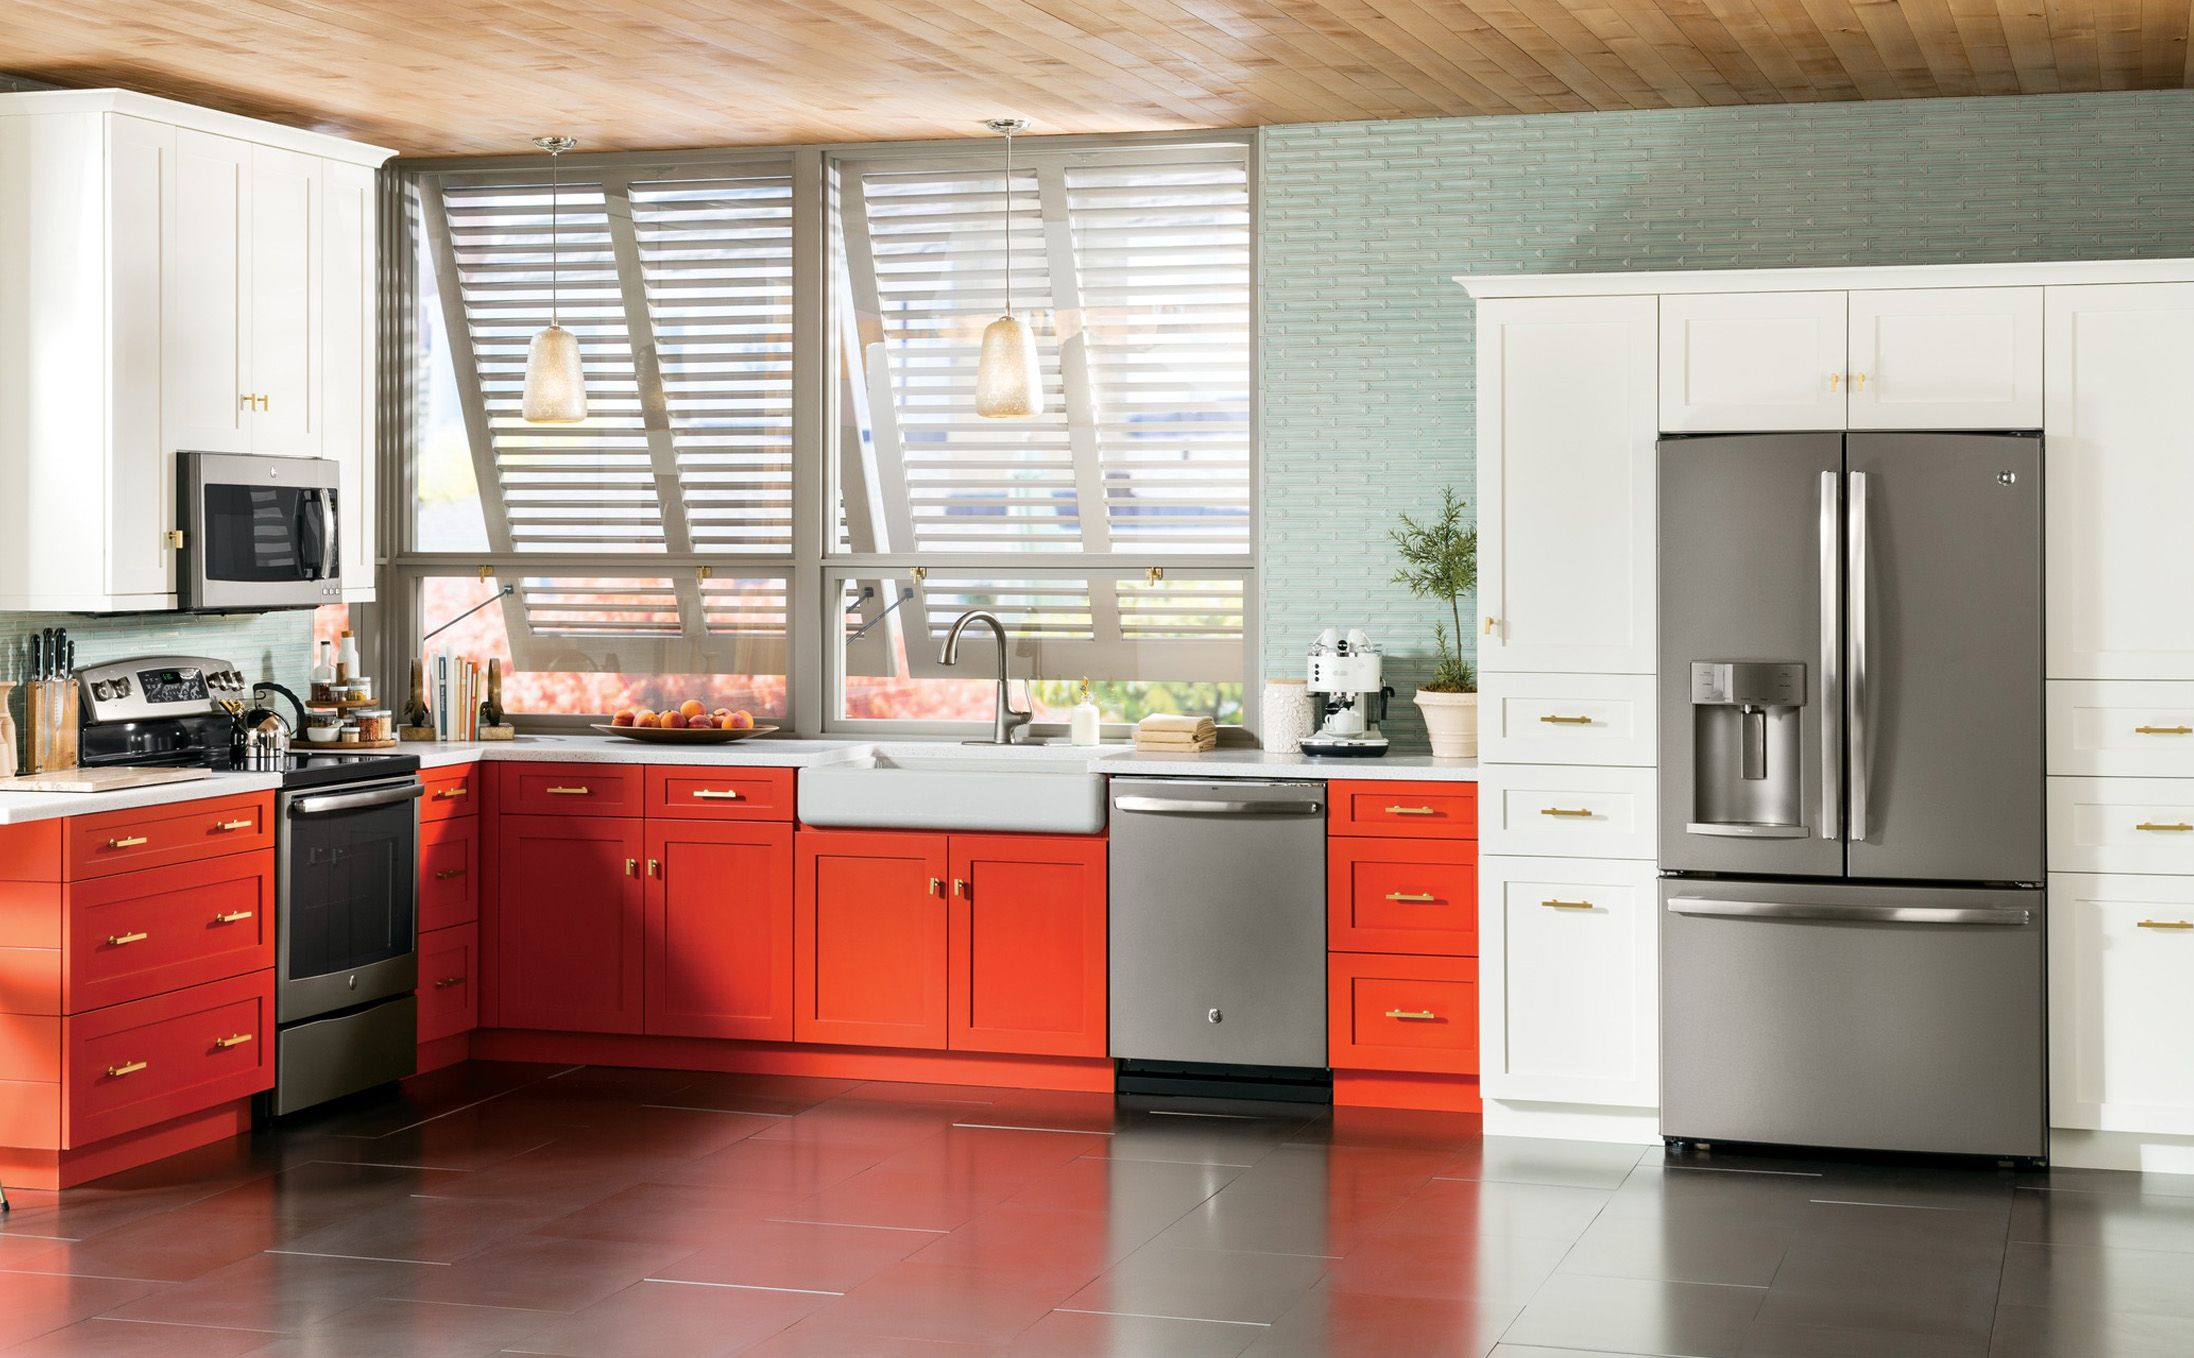 Paprika Kitchen Home depot kitchen, Kitchen design